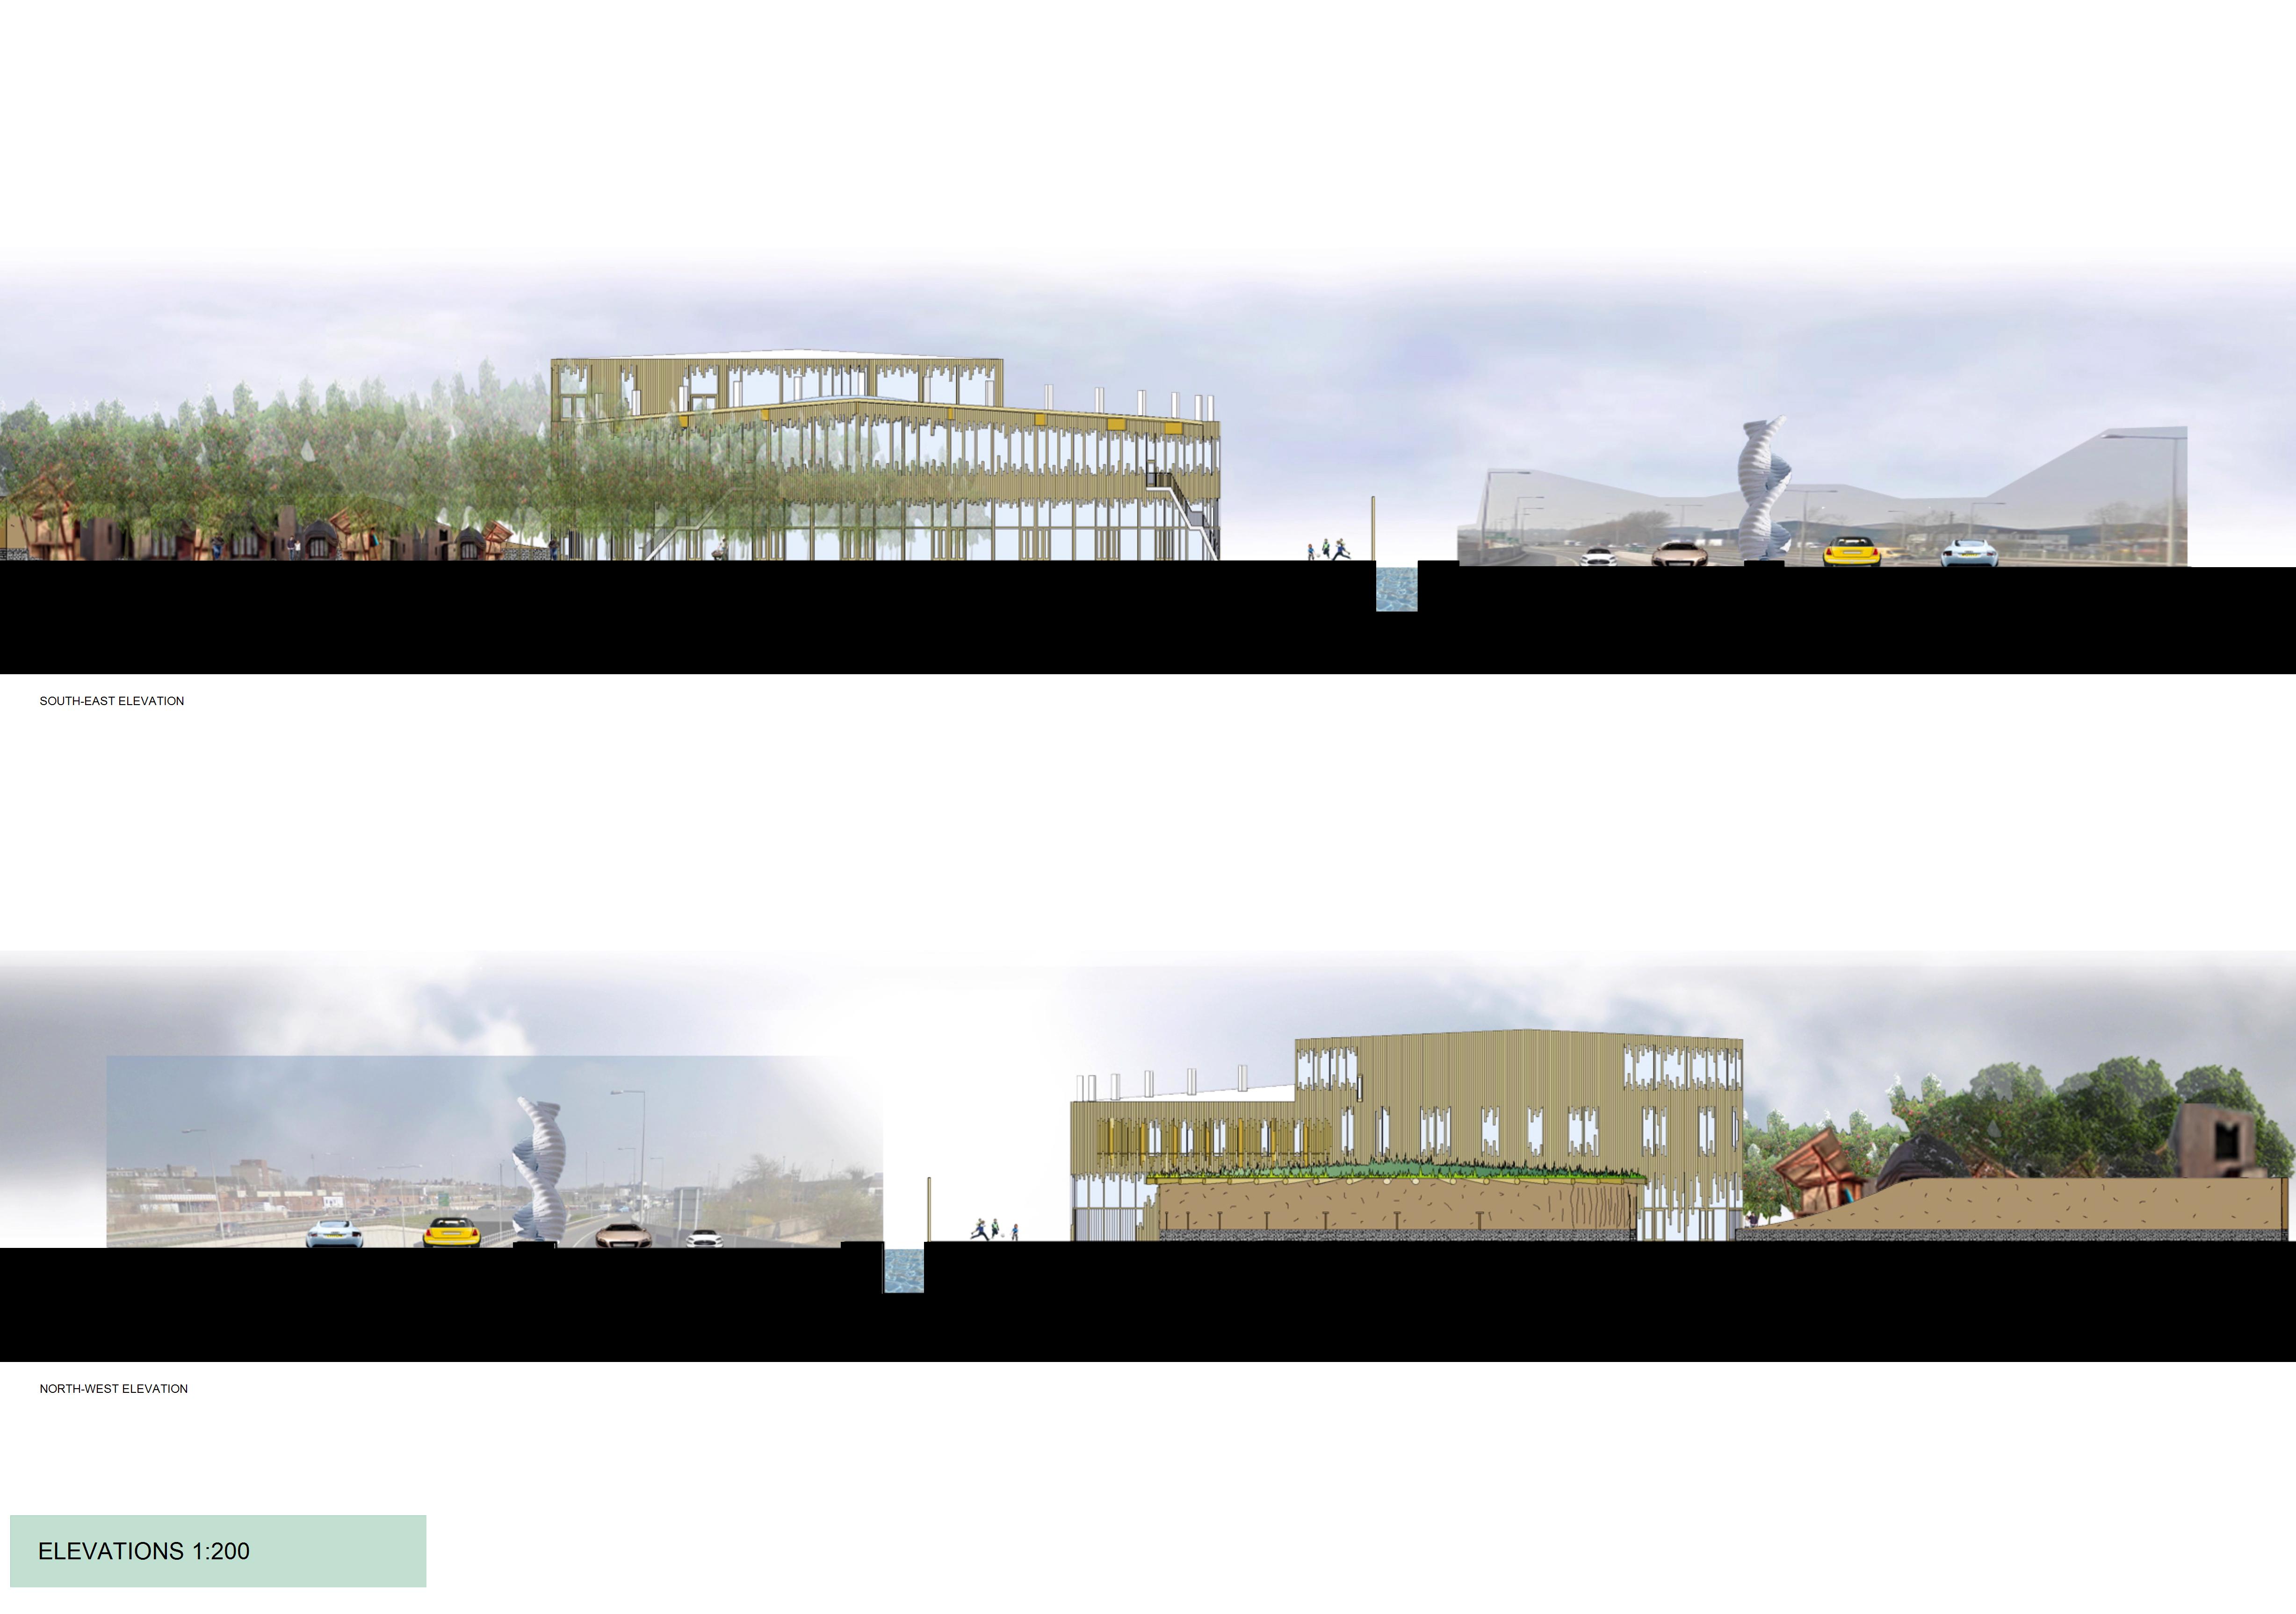 Stoke Sustainability College Elevations 2